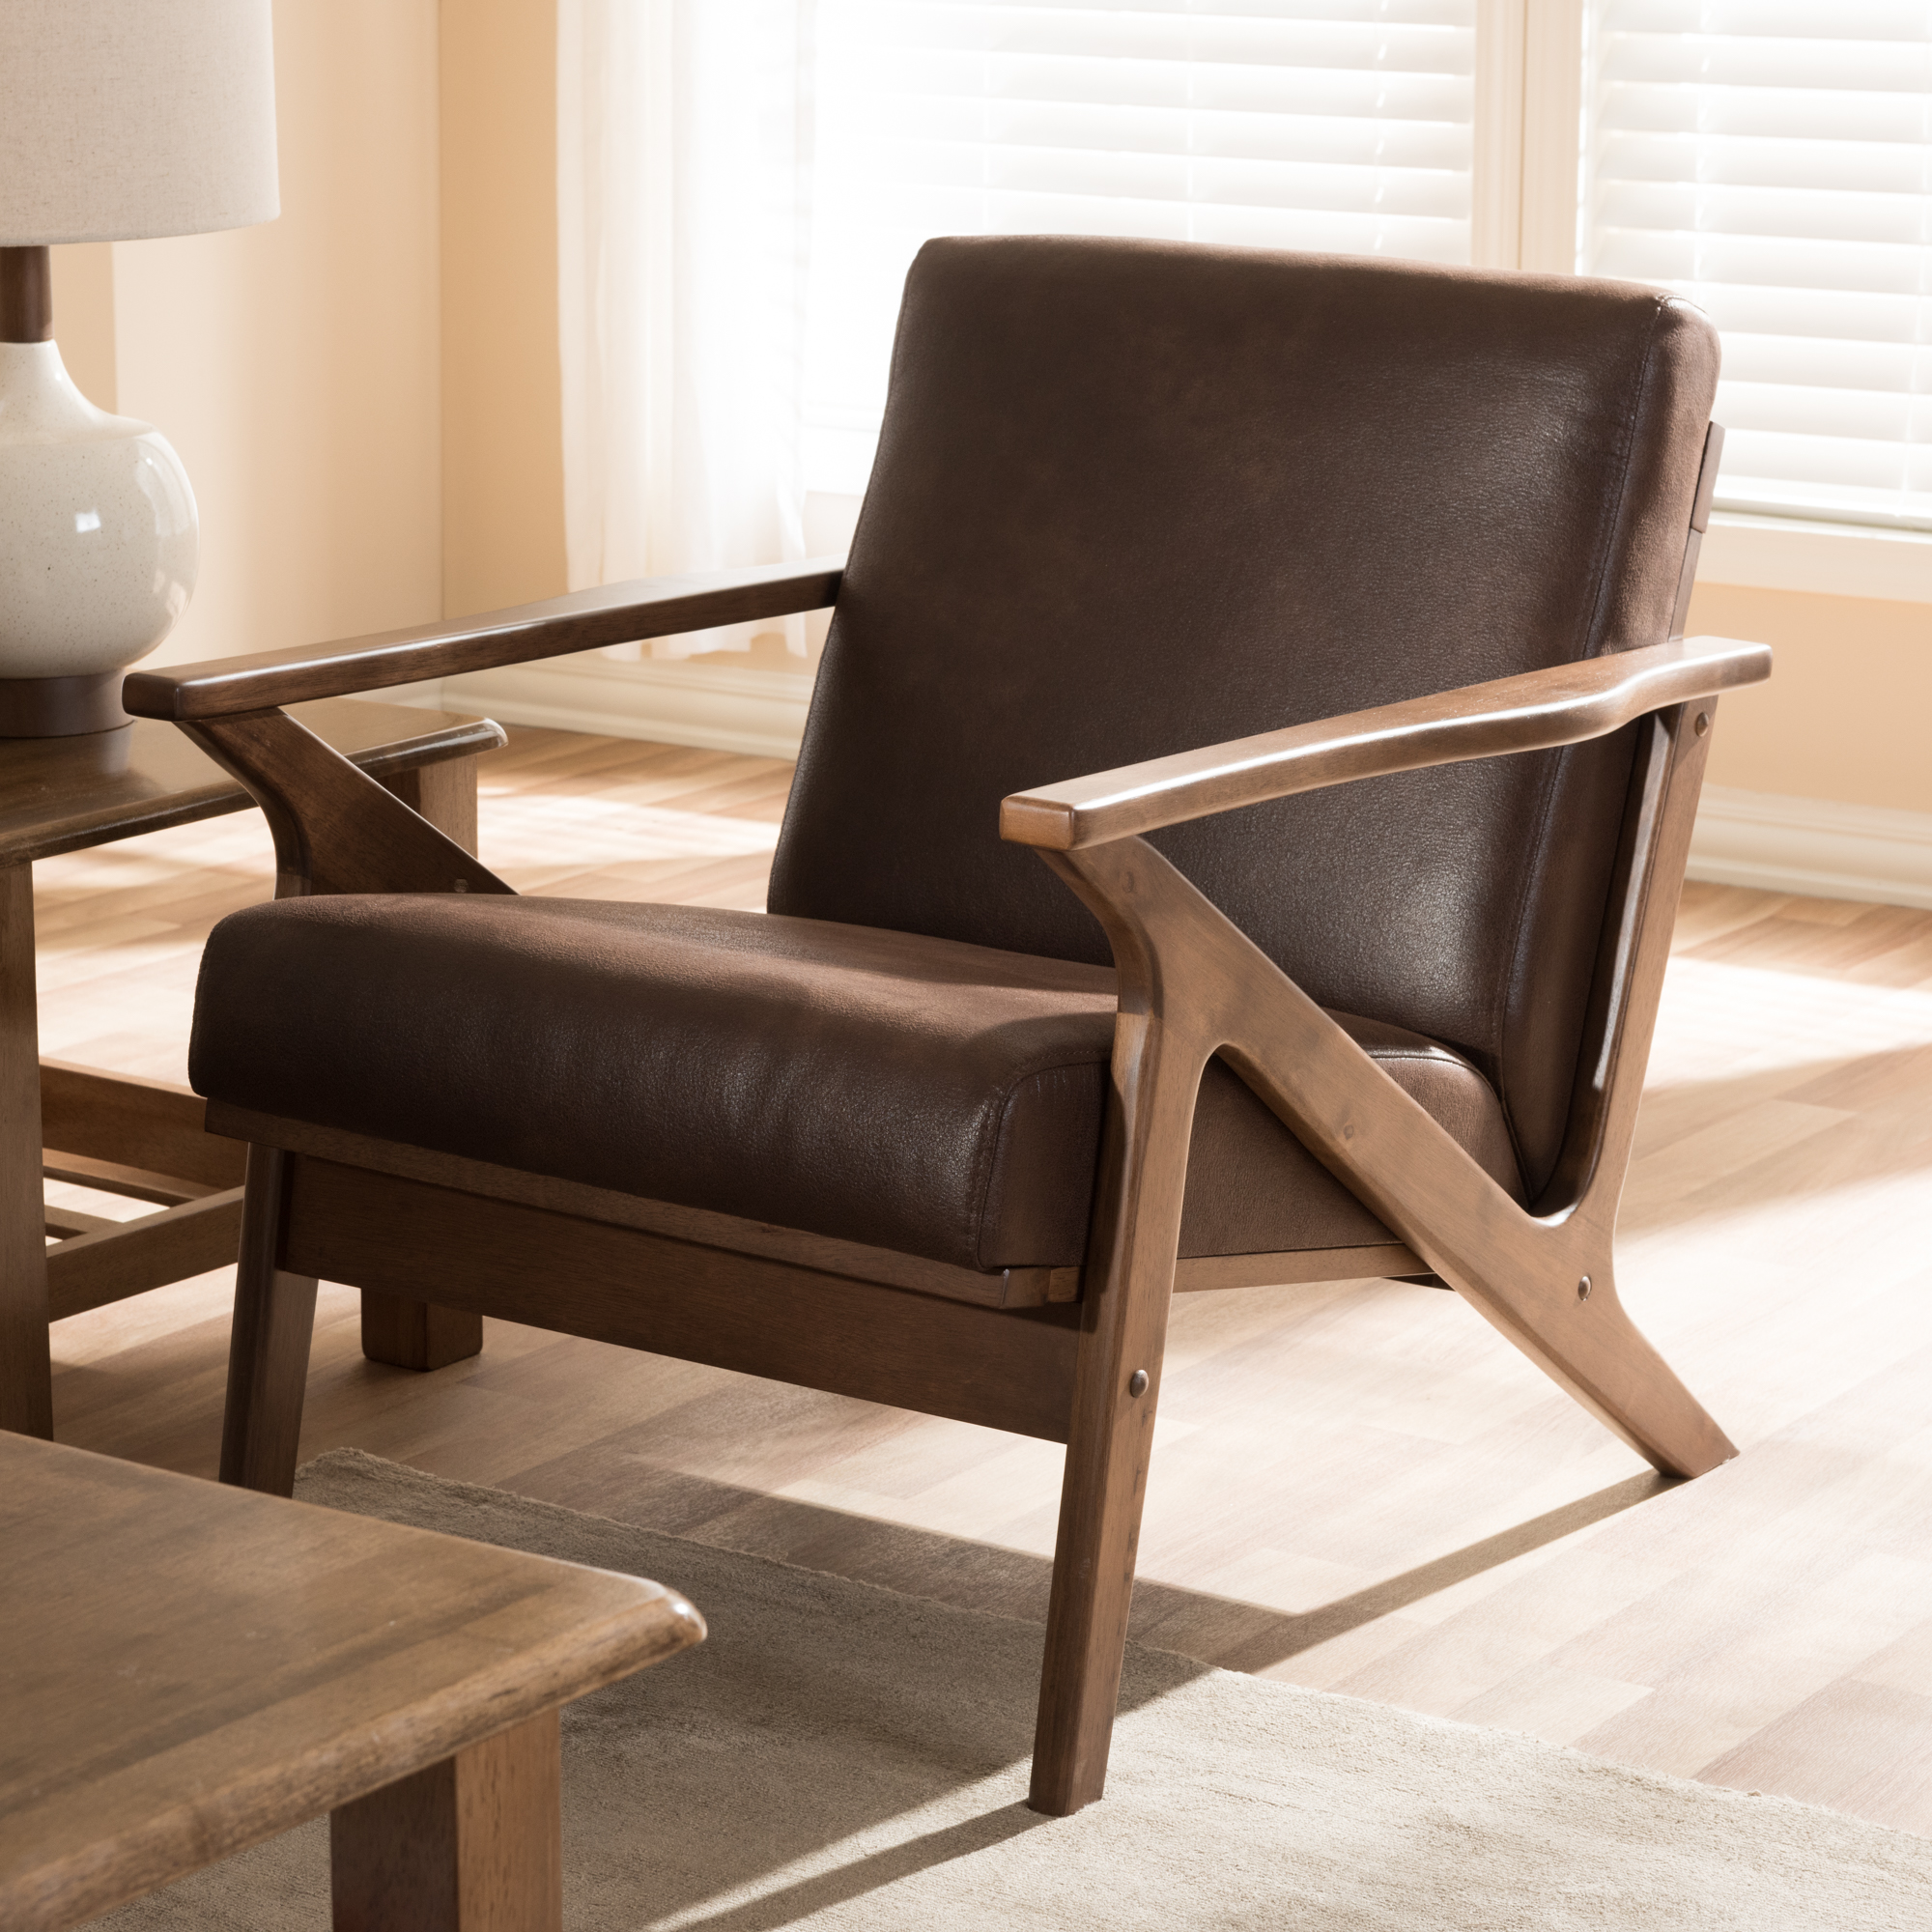 ... Baxton Studio Bianca Mid Century Modern Walnut Wood Dark Brown  Distressed Faux Leather Lounge Chair ...